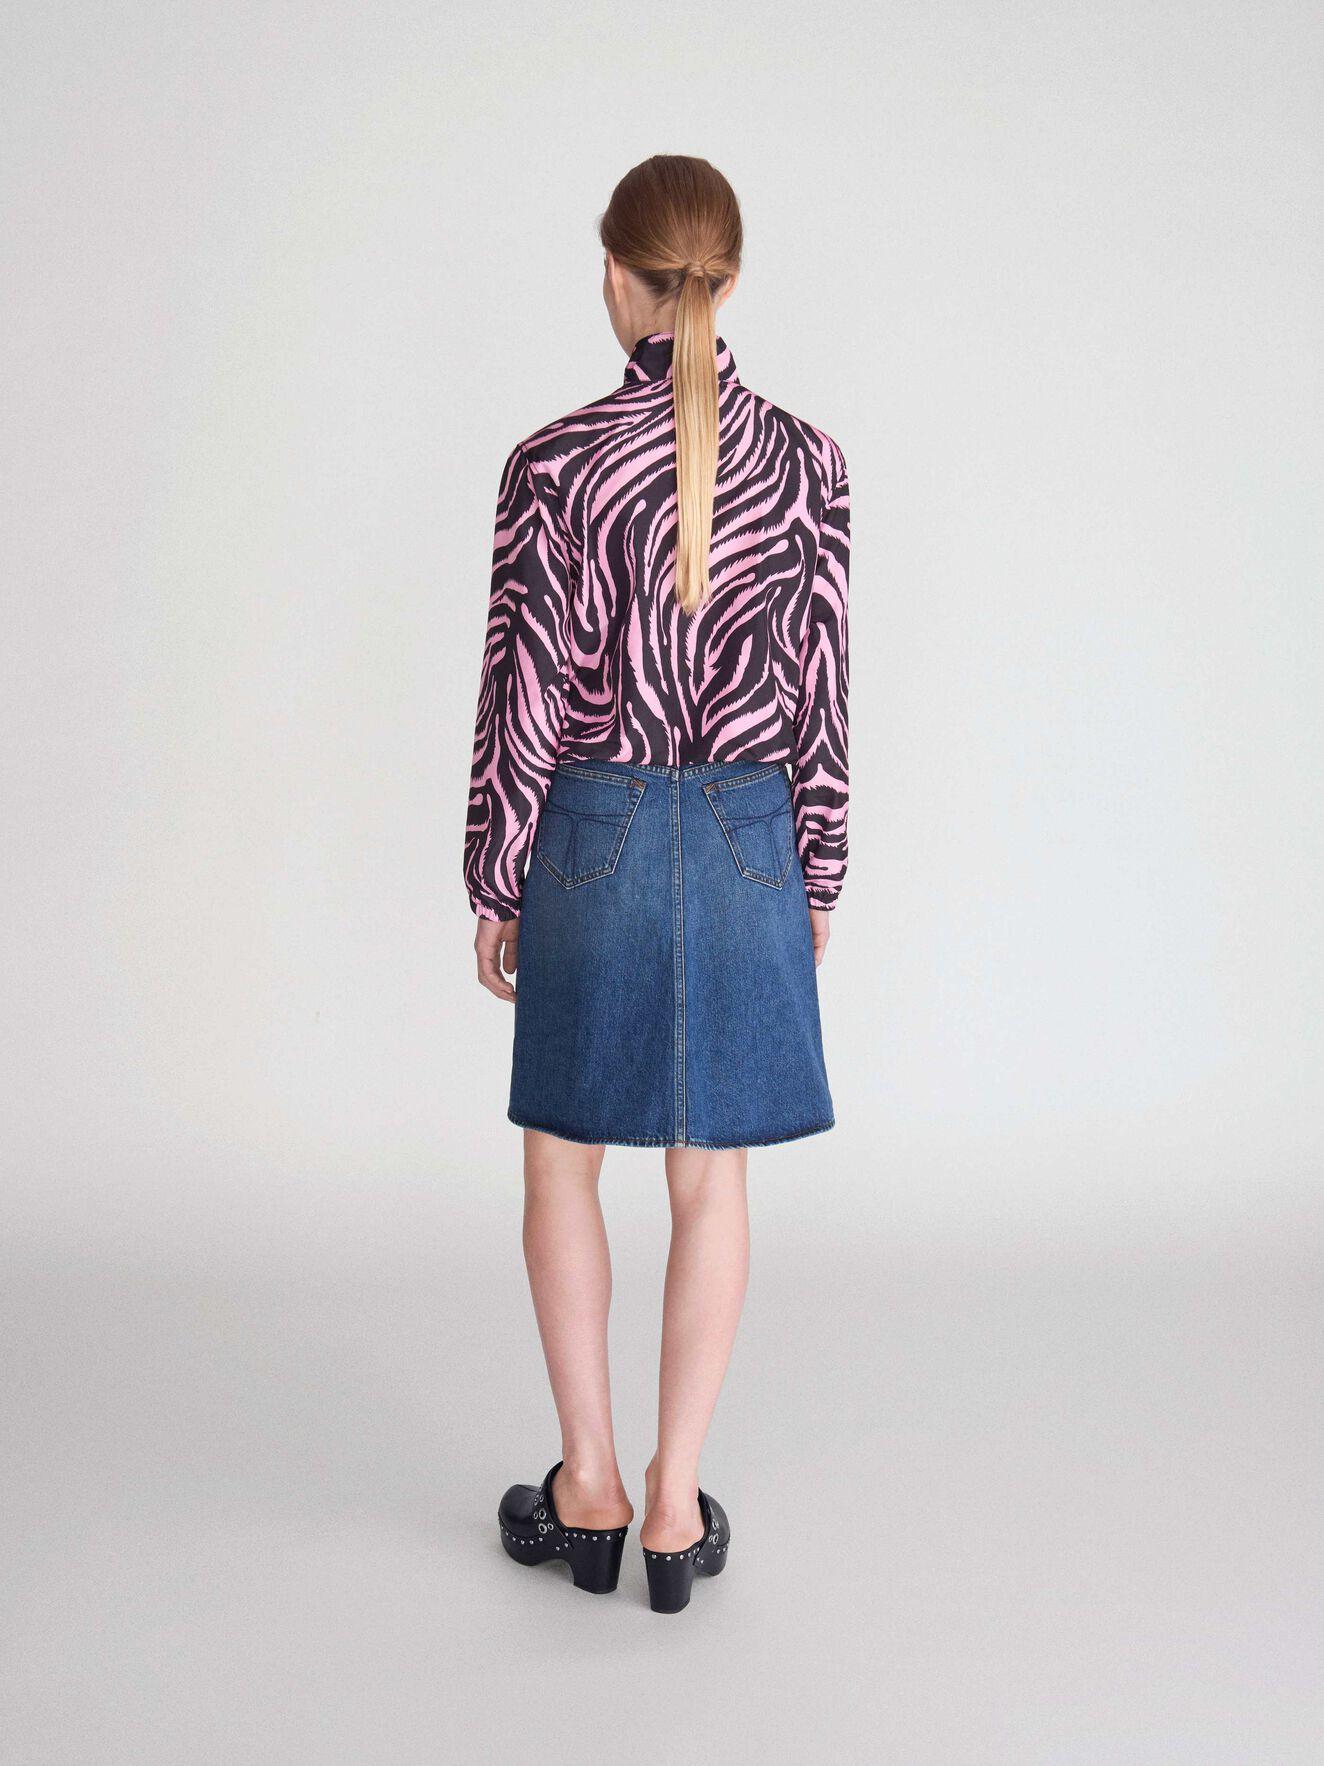 Liz Skirt in Medium Blue from Tiger of Sweden